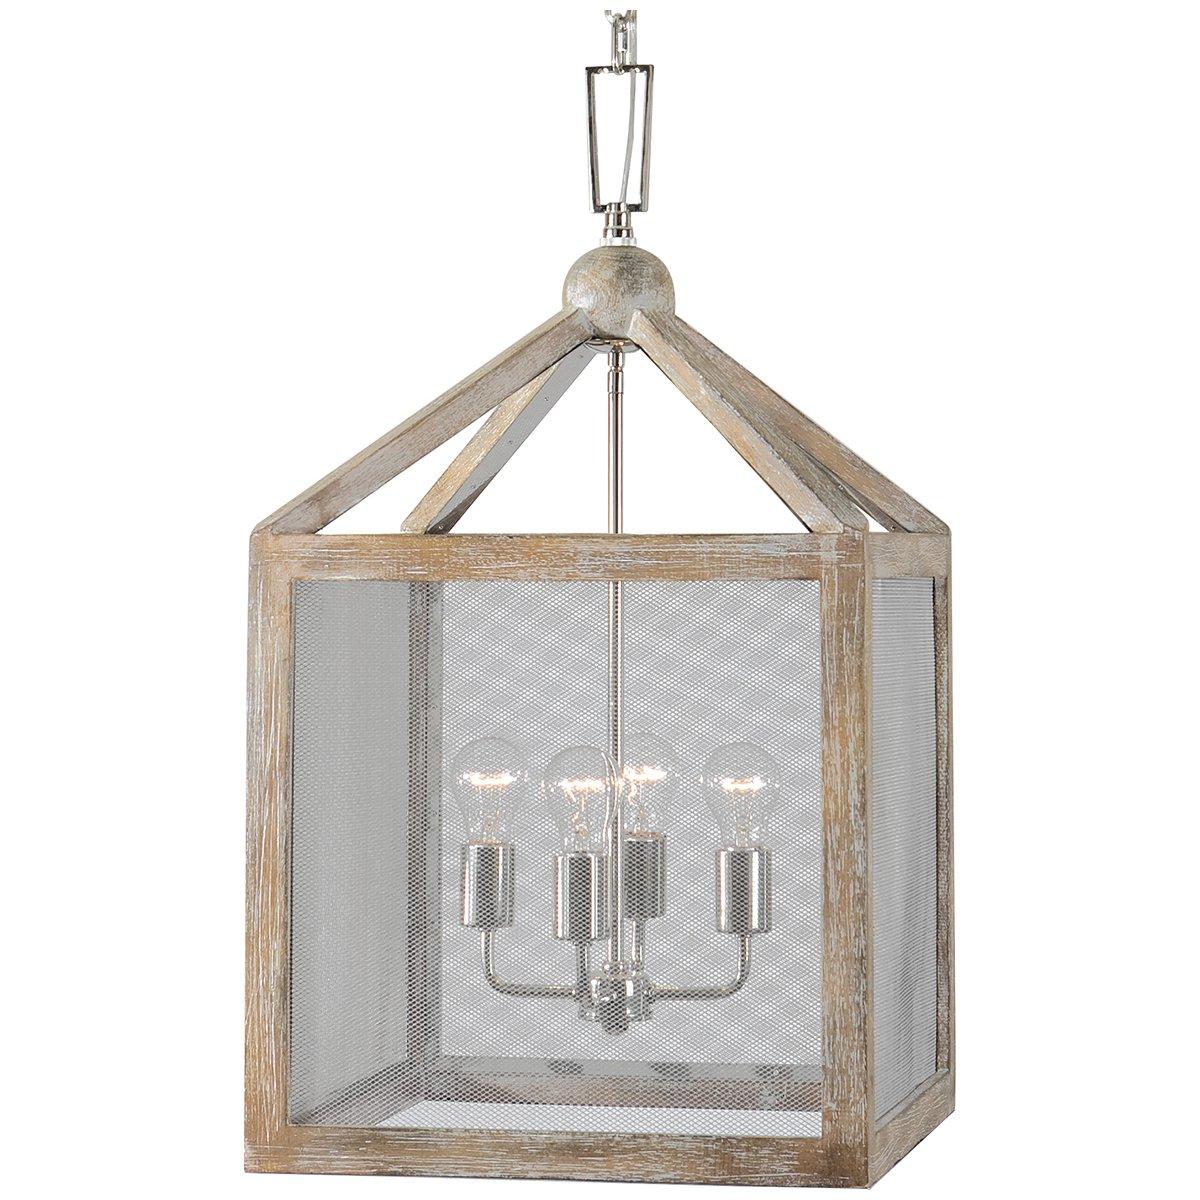 Amazon uttermost 22050 nashua 4 light wooden lantern pendant amazon uttermost 22050 nashua 4 light wooden lantern pendant home kitchen arubaitofo Image collections